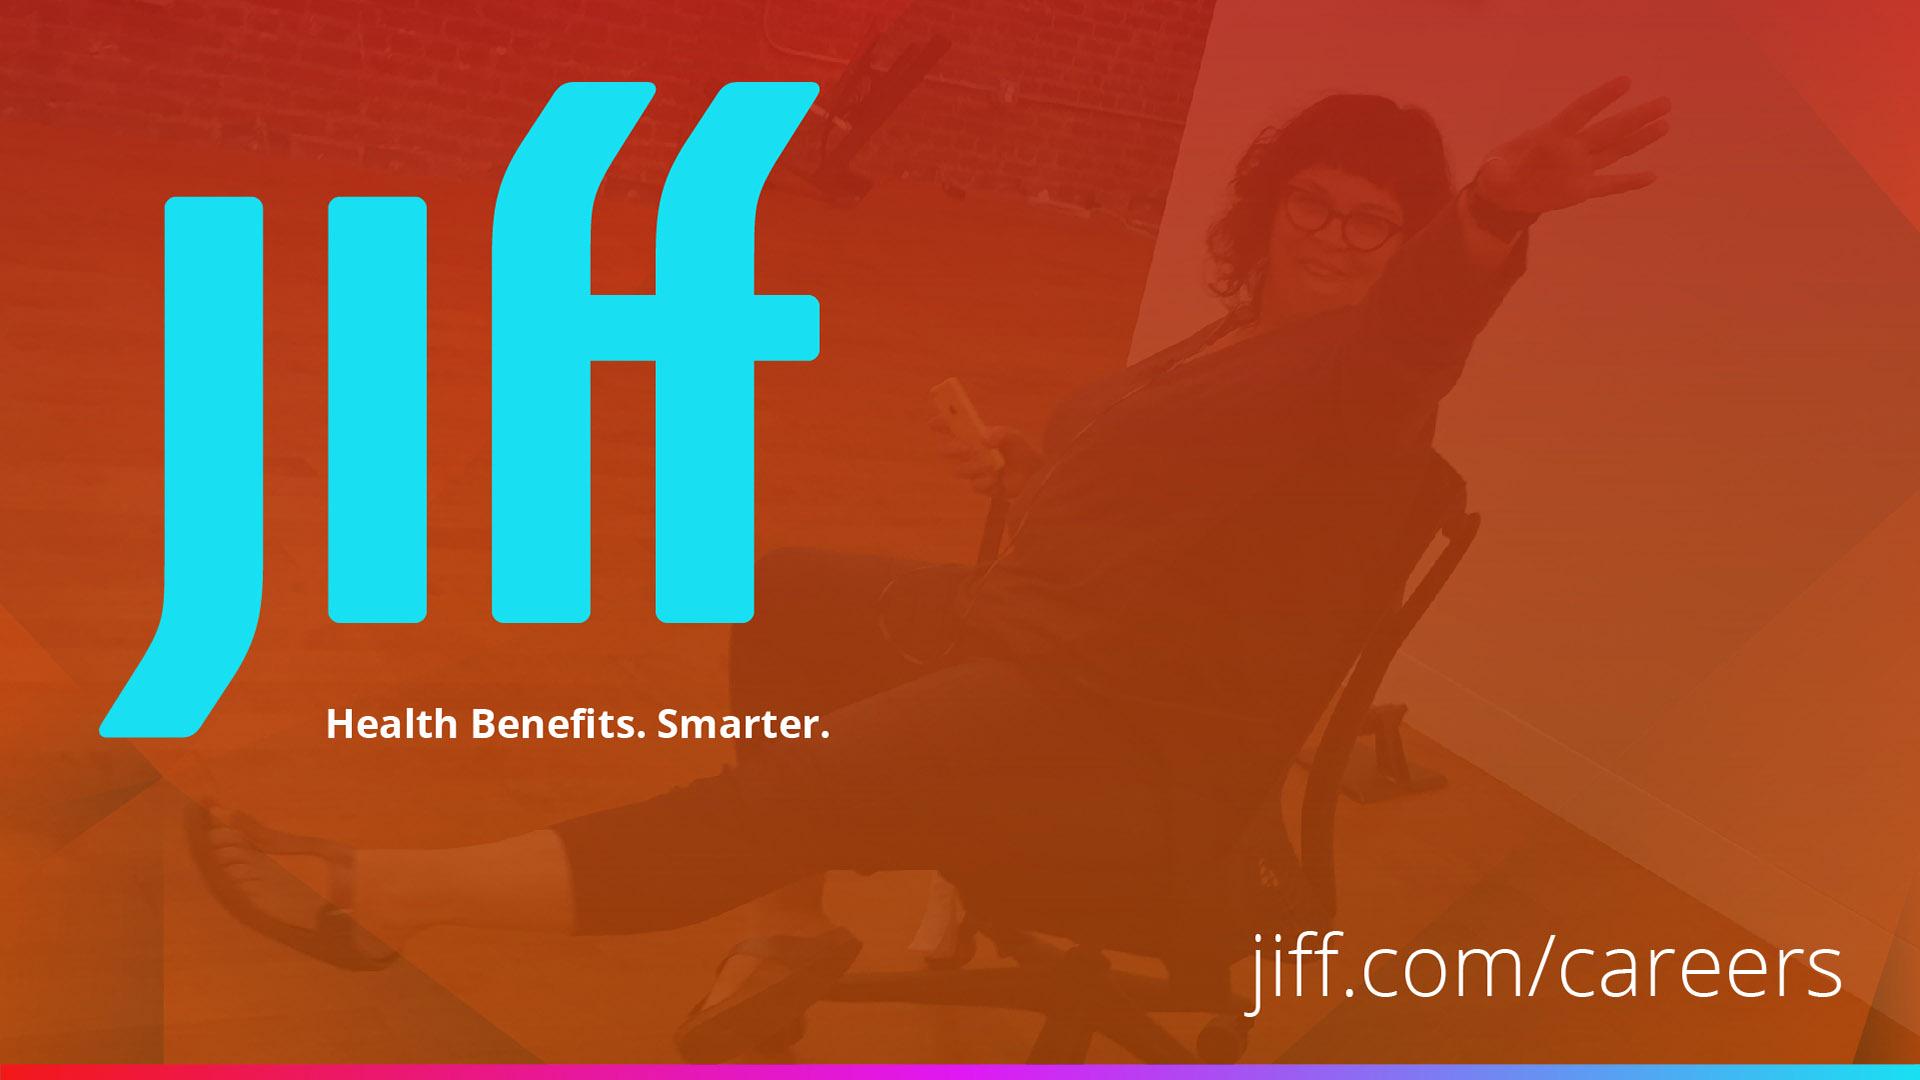 Jiff_Recruitment Slide-08.jpg